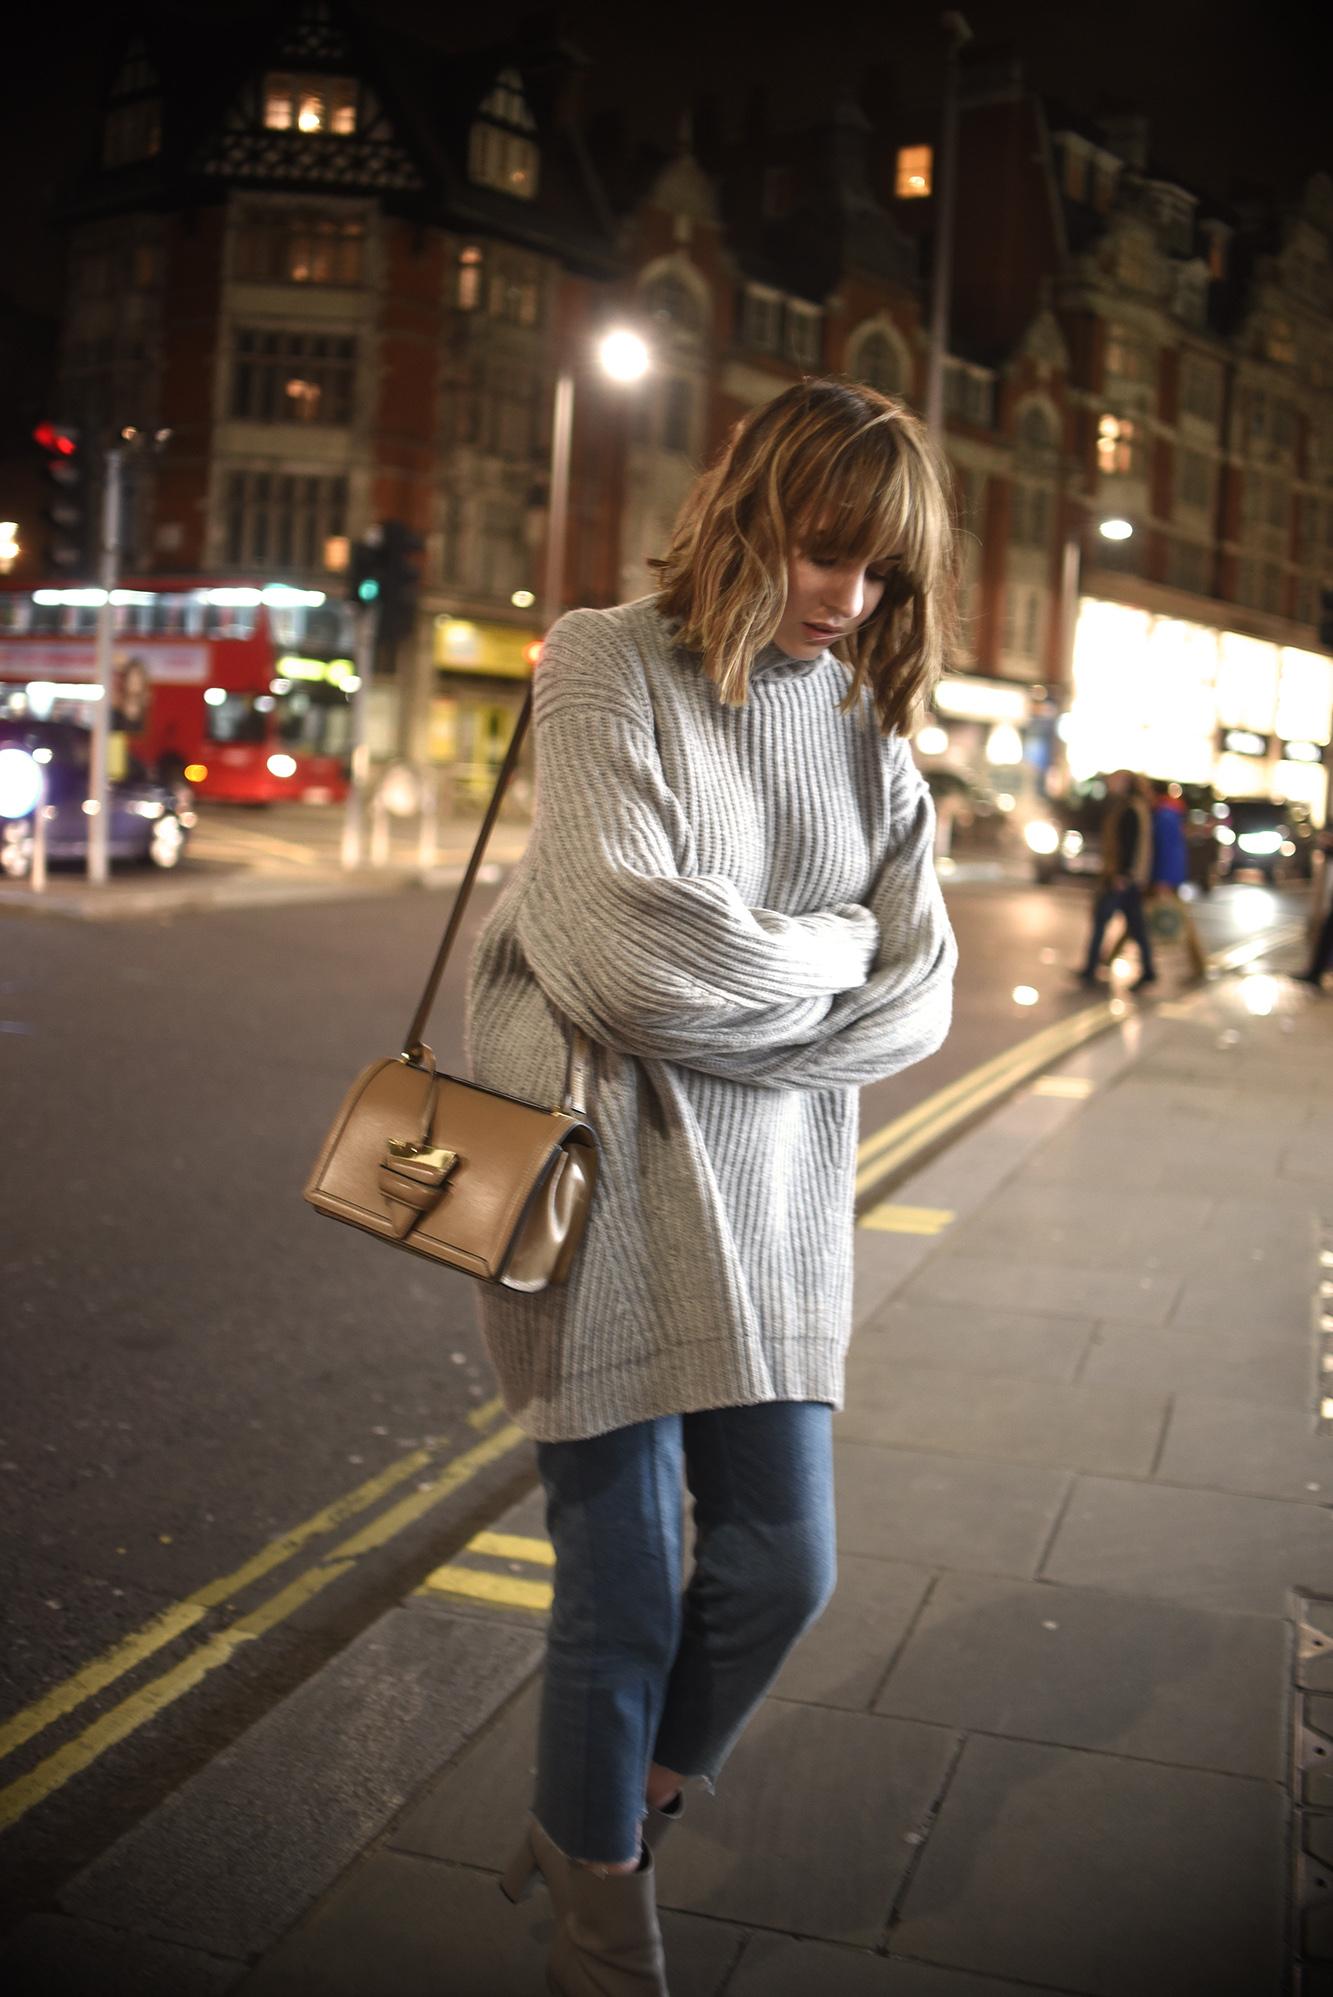 ShotFromTheStreet-London-24.jpg